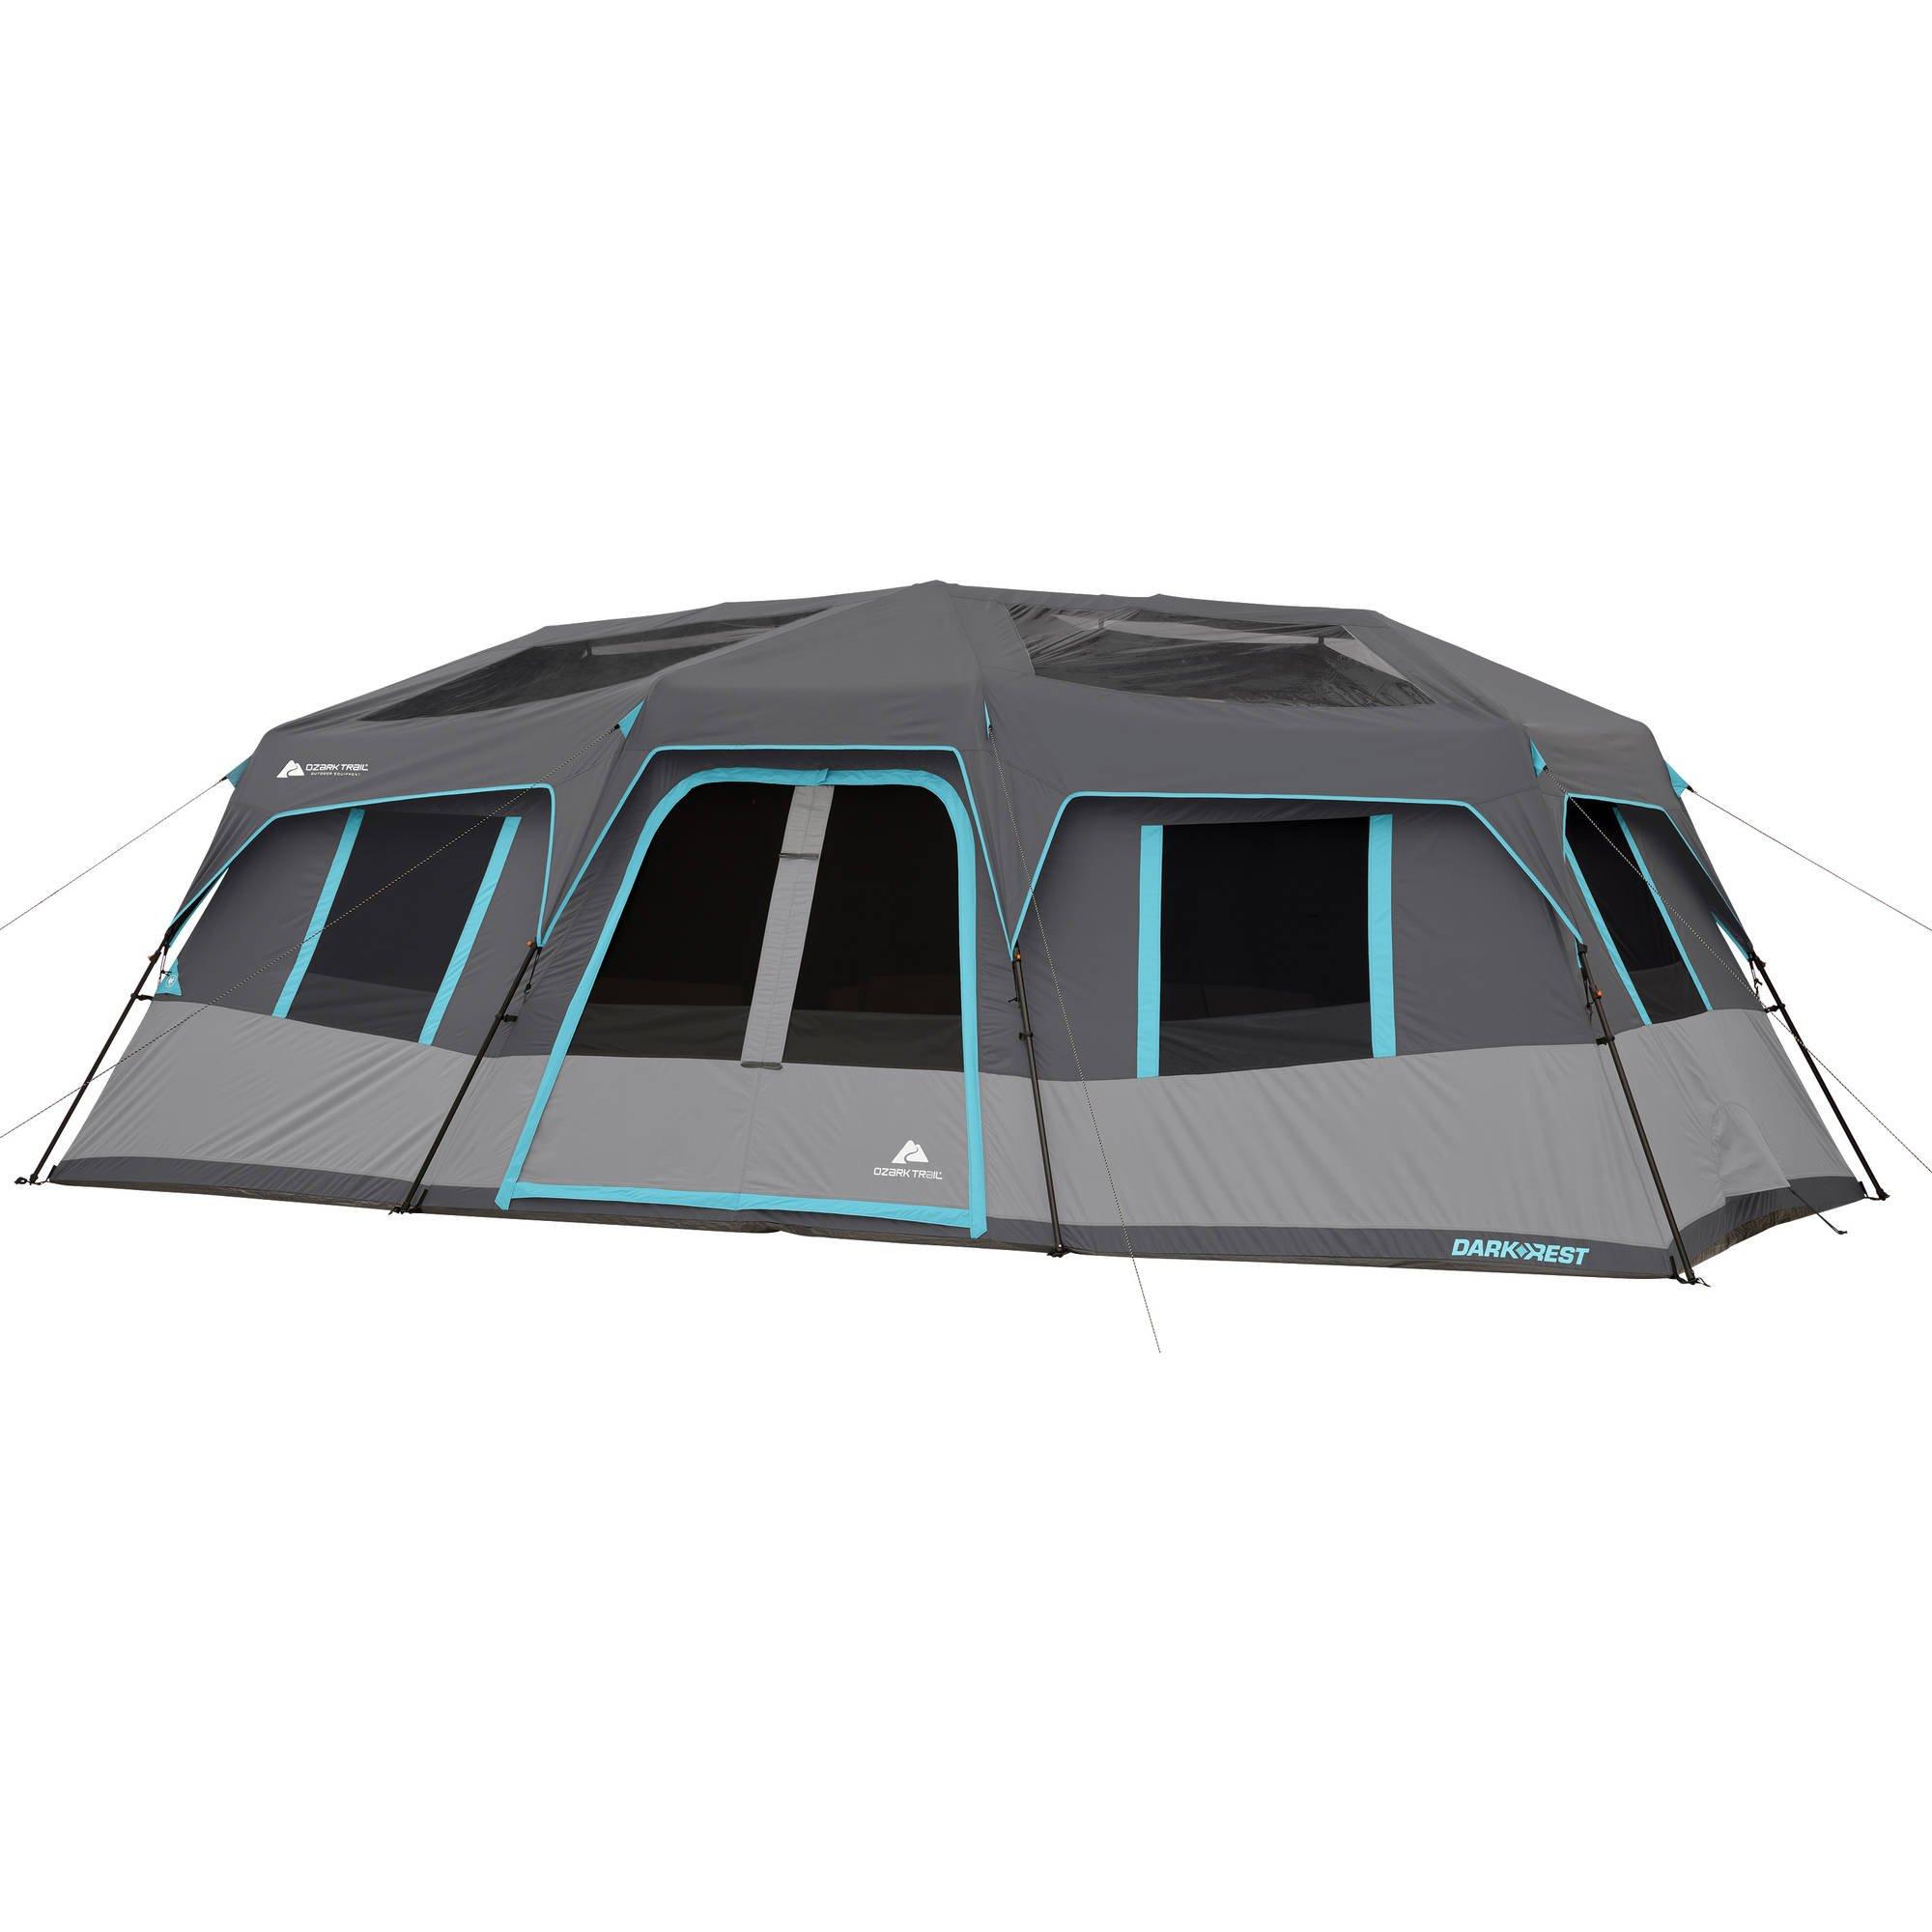 Ozark Trail 20' x 10' Dark Rest Instant Cabin Tent, Sleeps 12